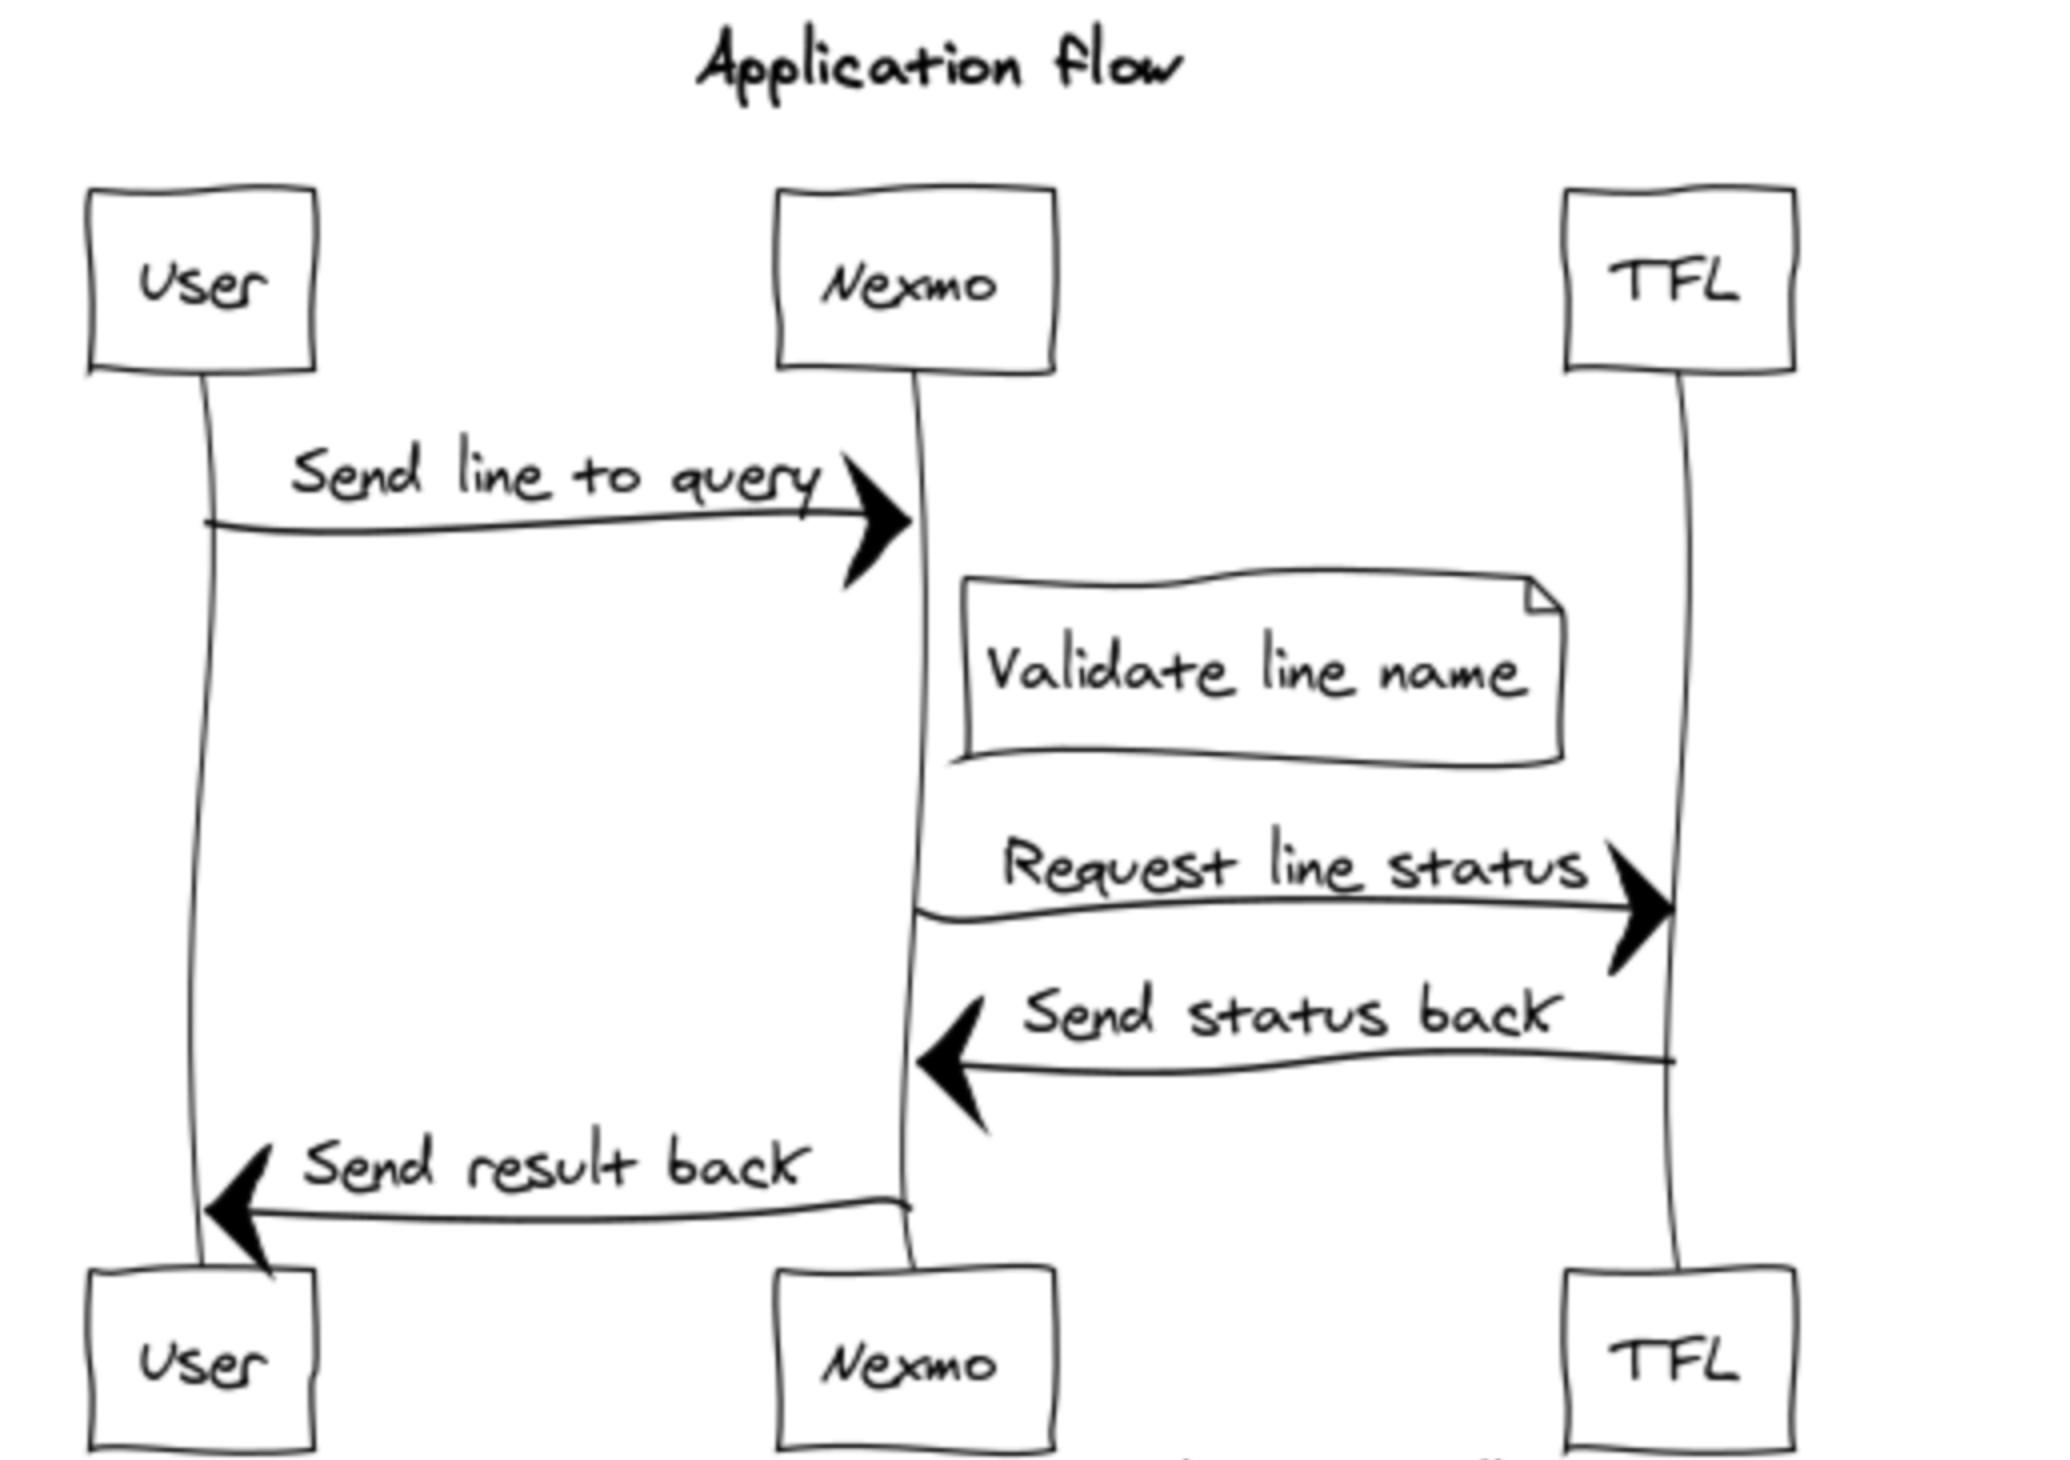 sketch diagram of workflow